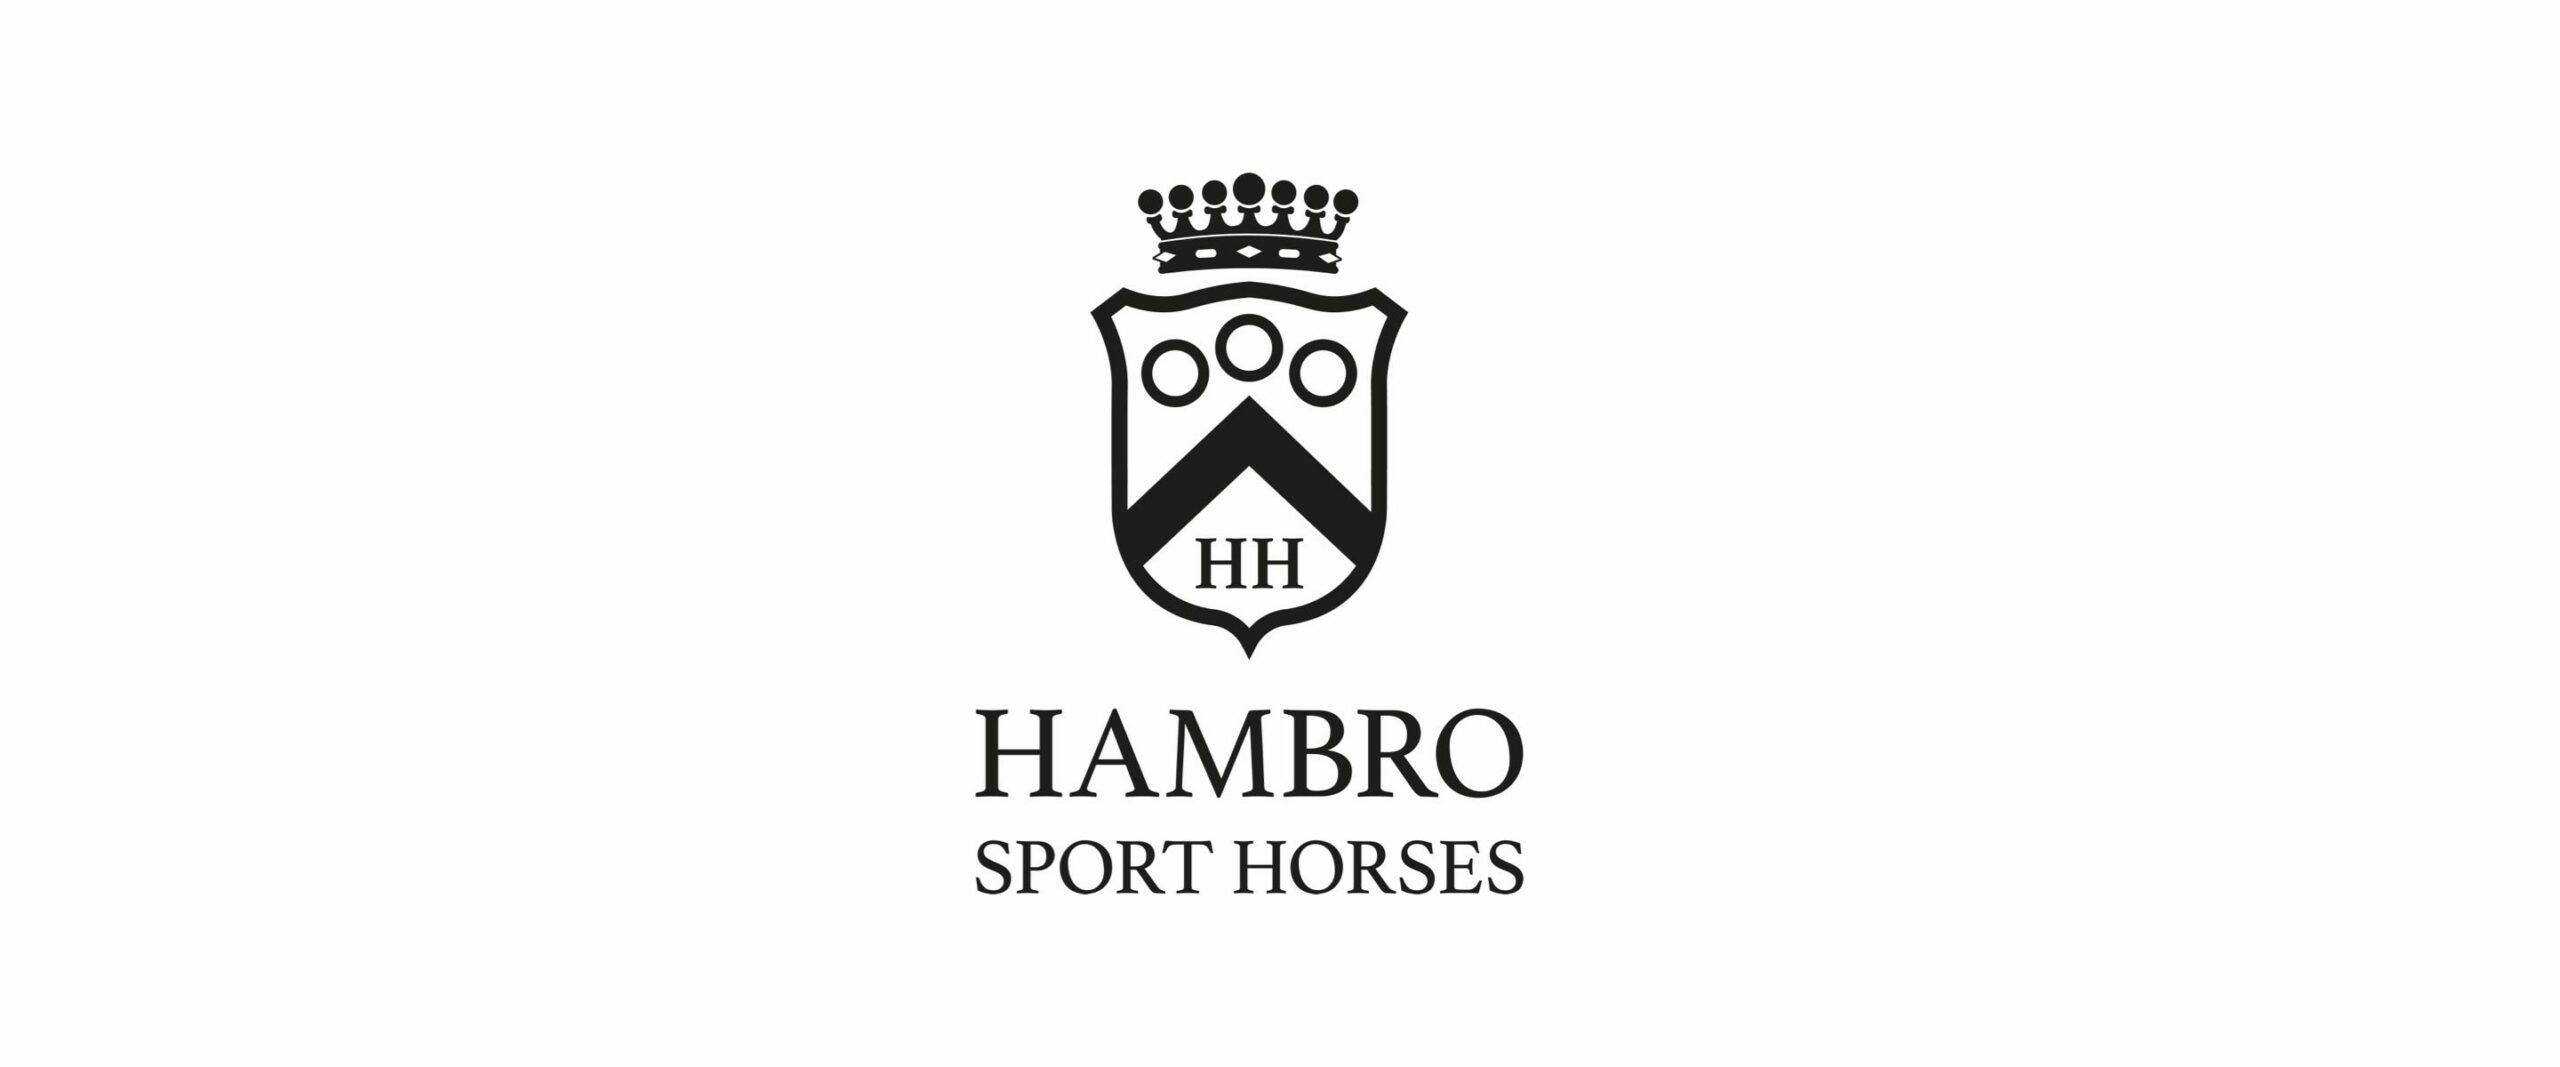 Hambro Sport Horses